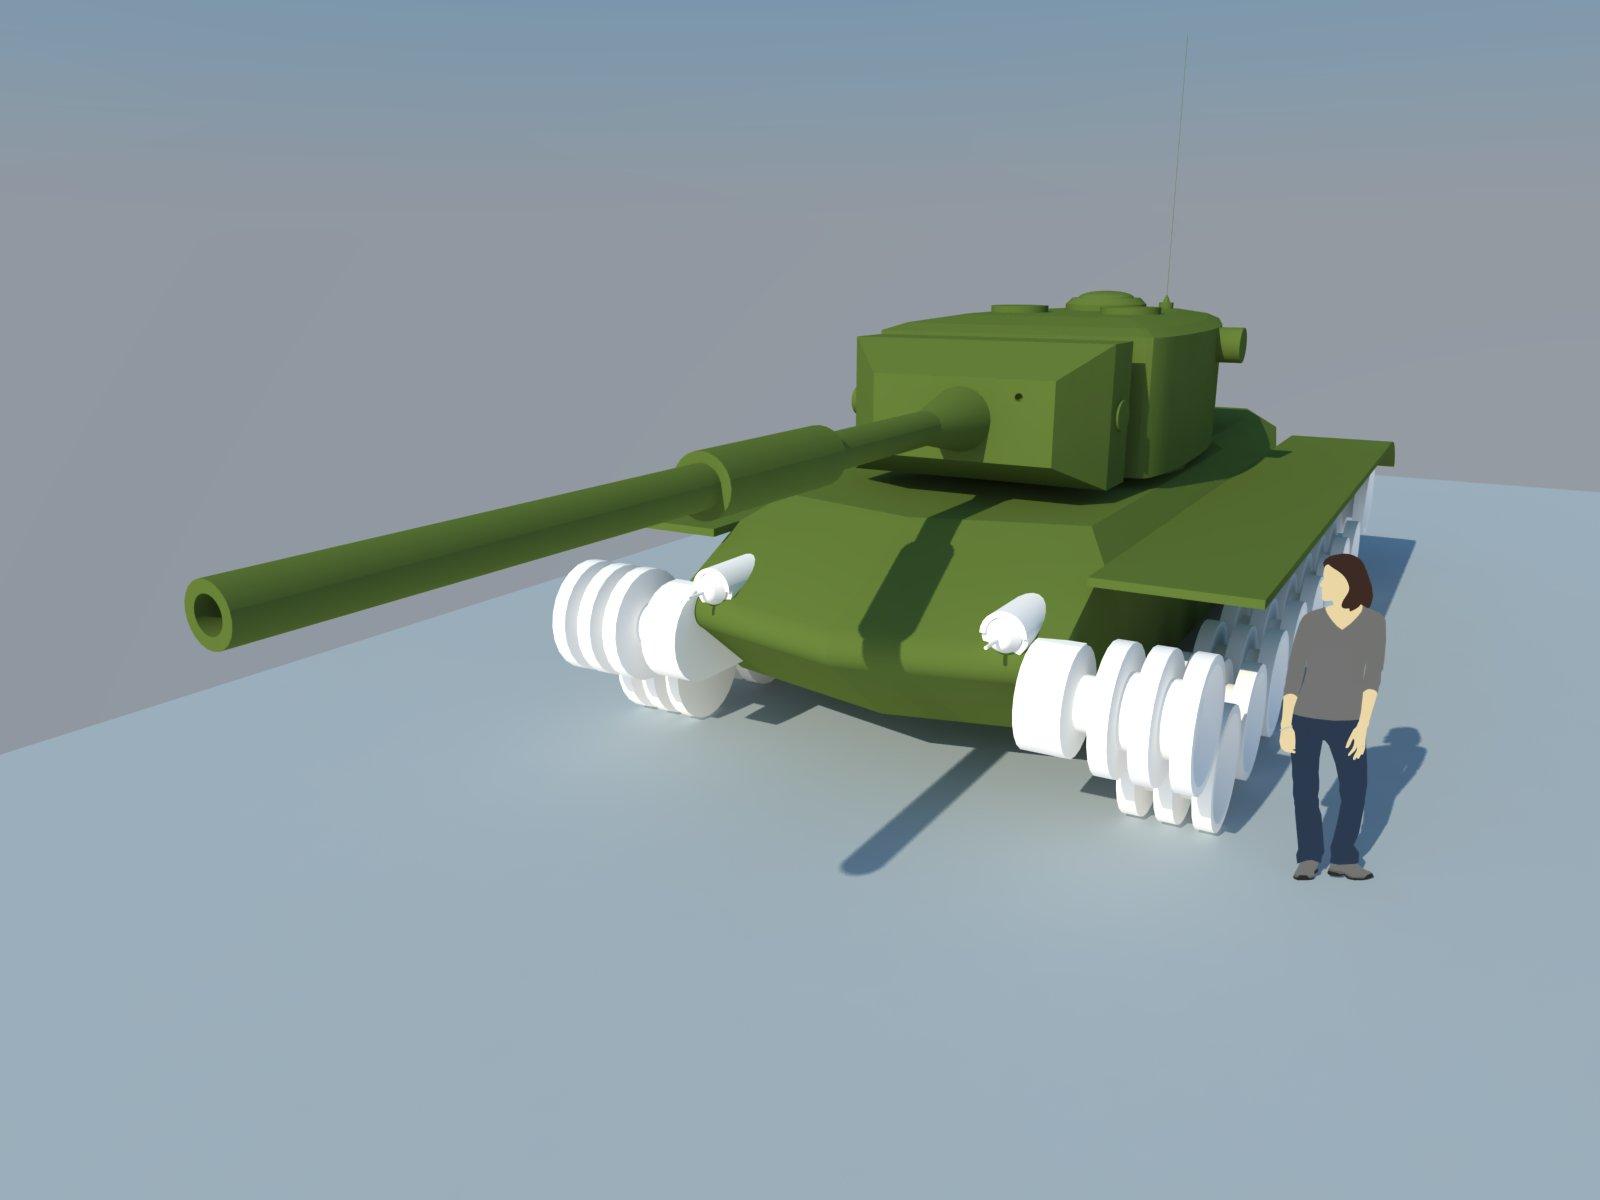 Sketchup Redevelopment Tanks - Fan Art - World of Tanks